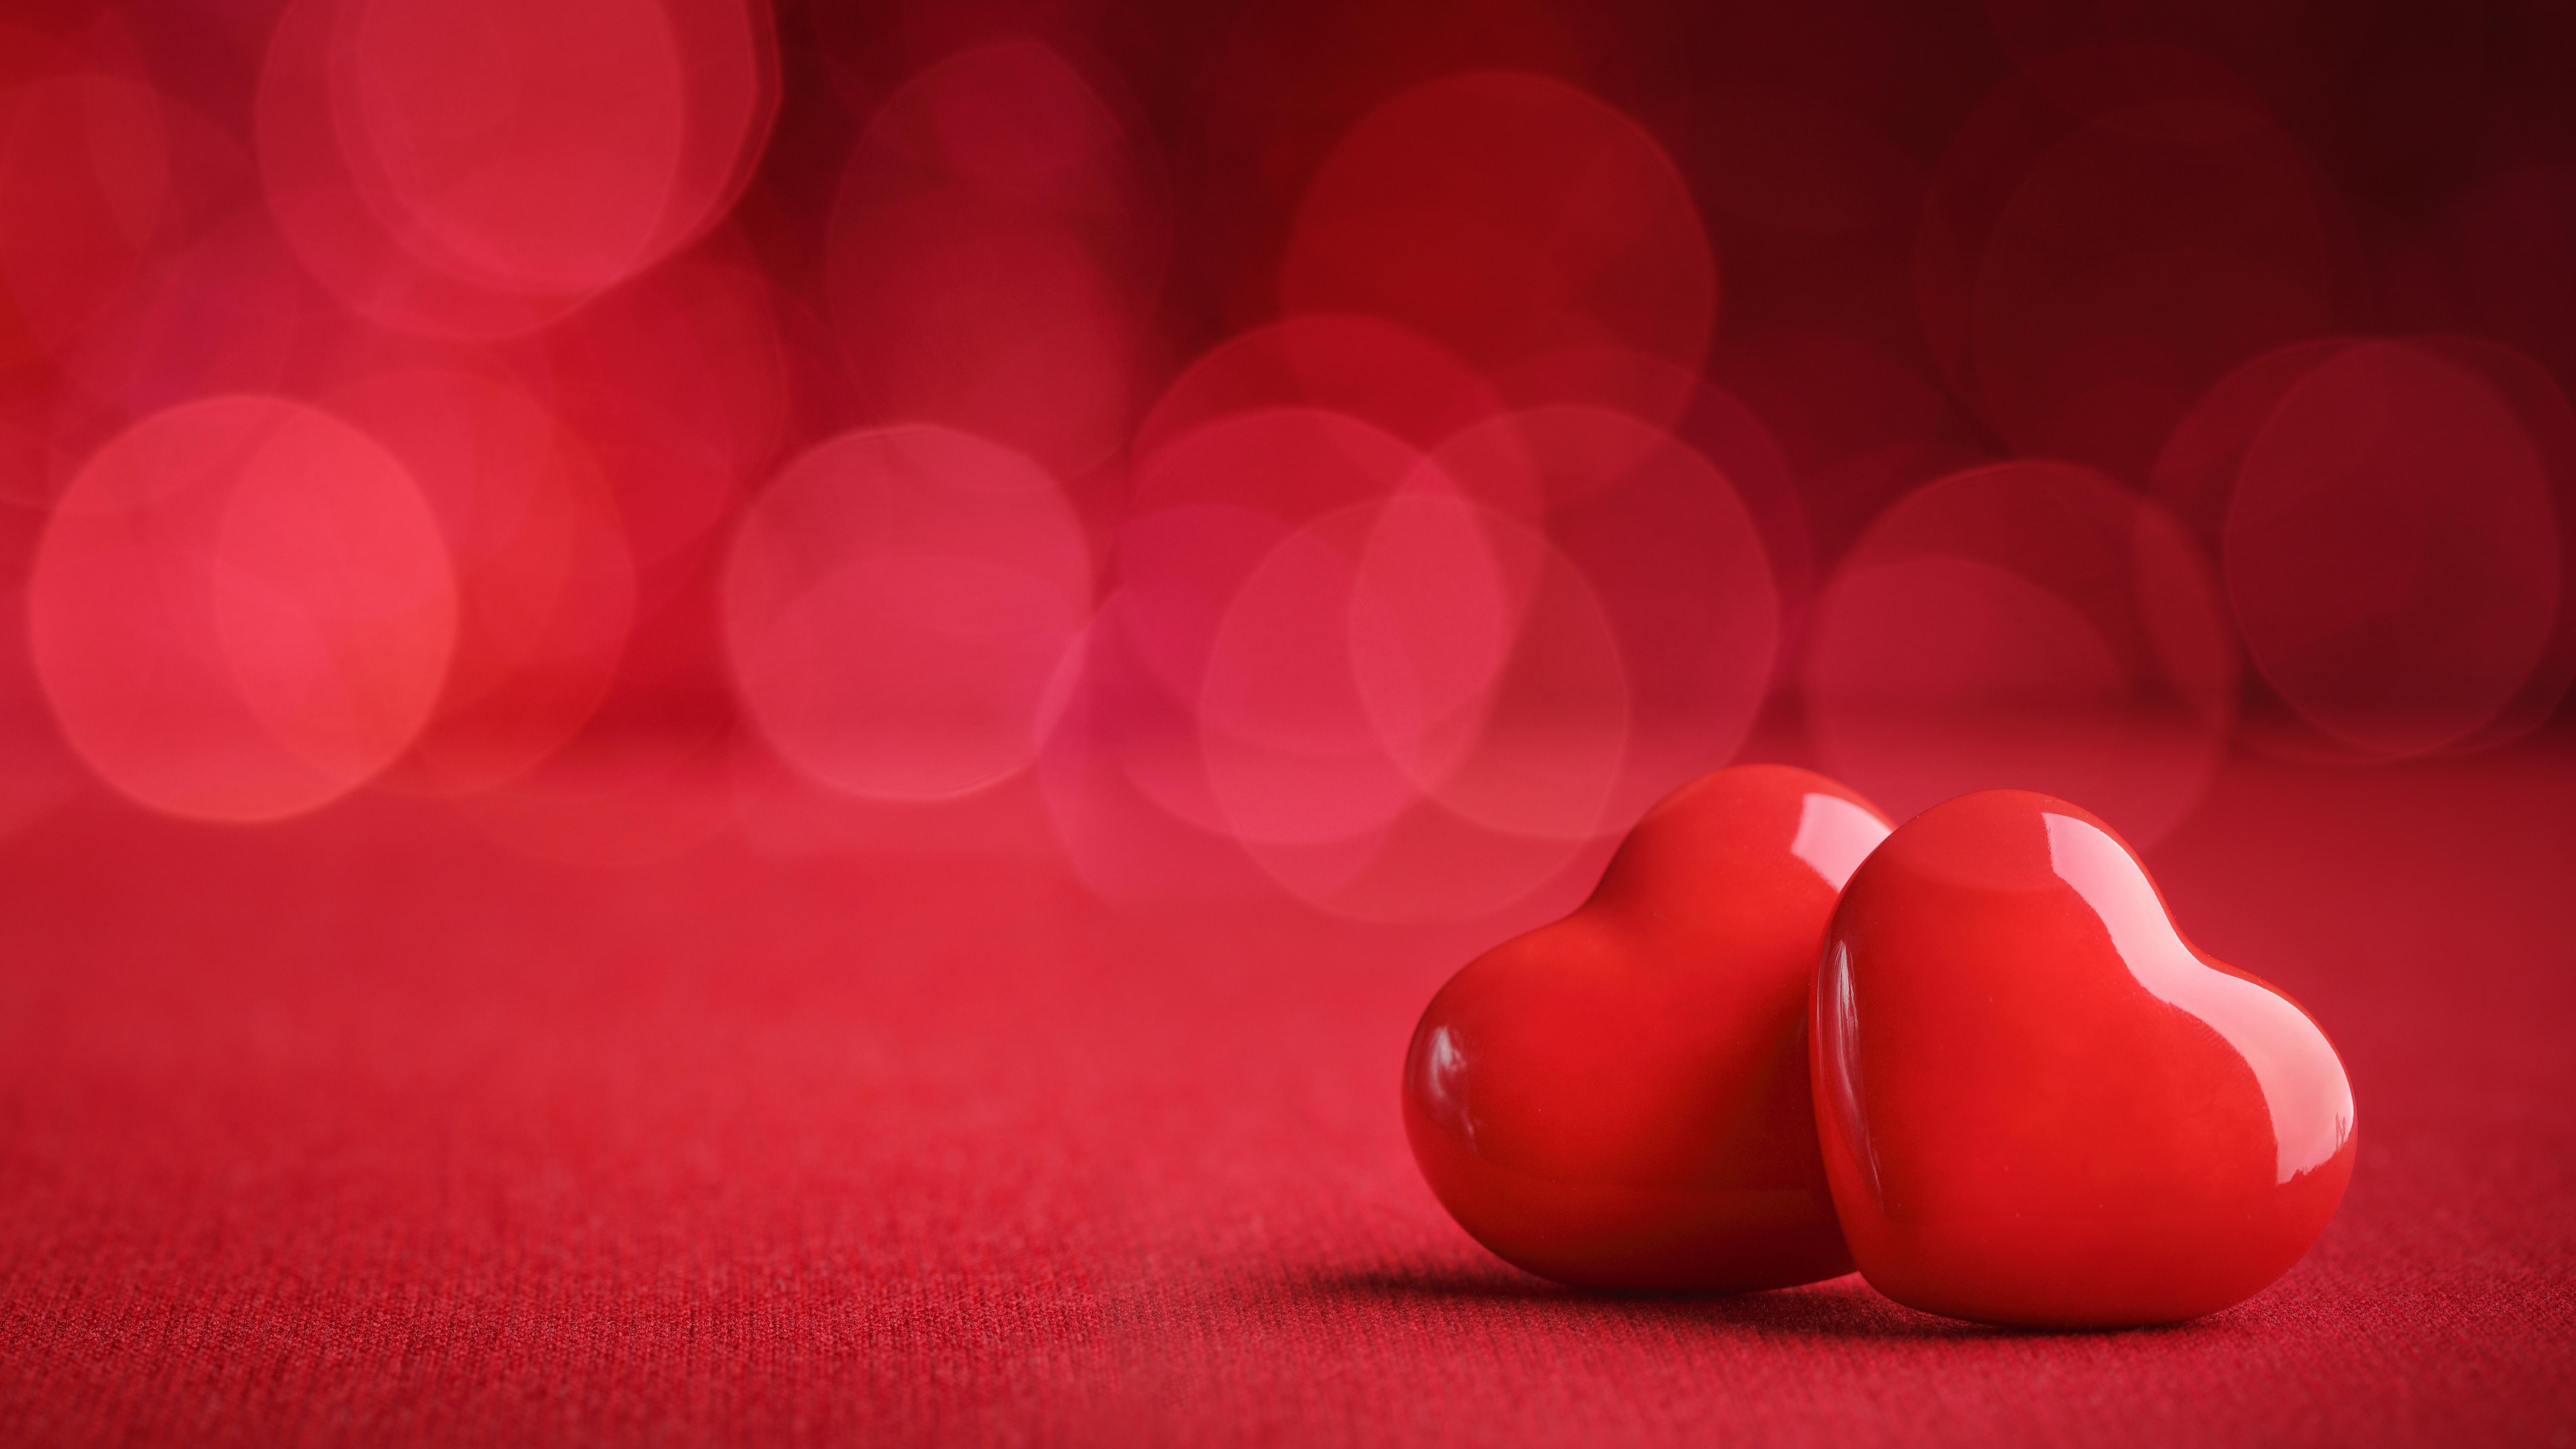 Сердце рисунок валентинов день без смс